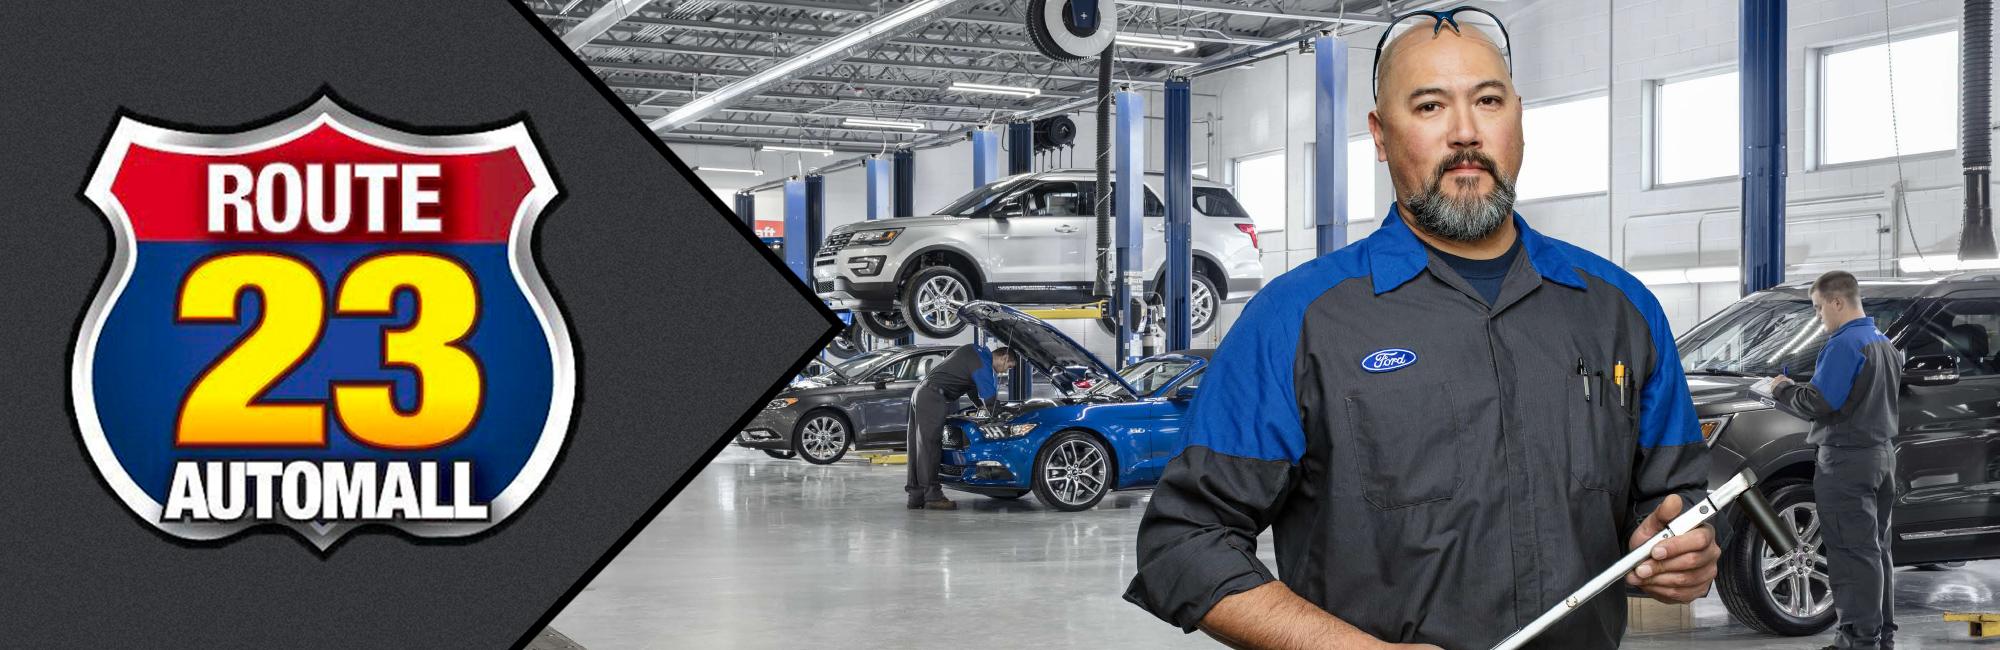 Ford service NJ